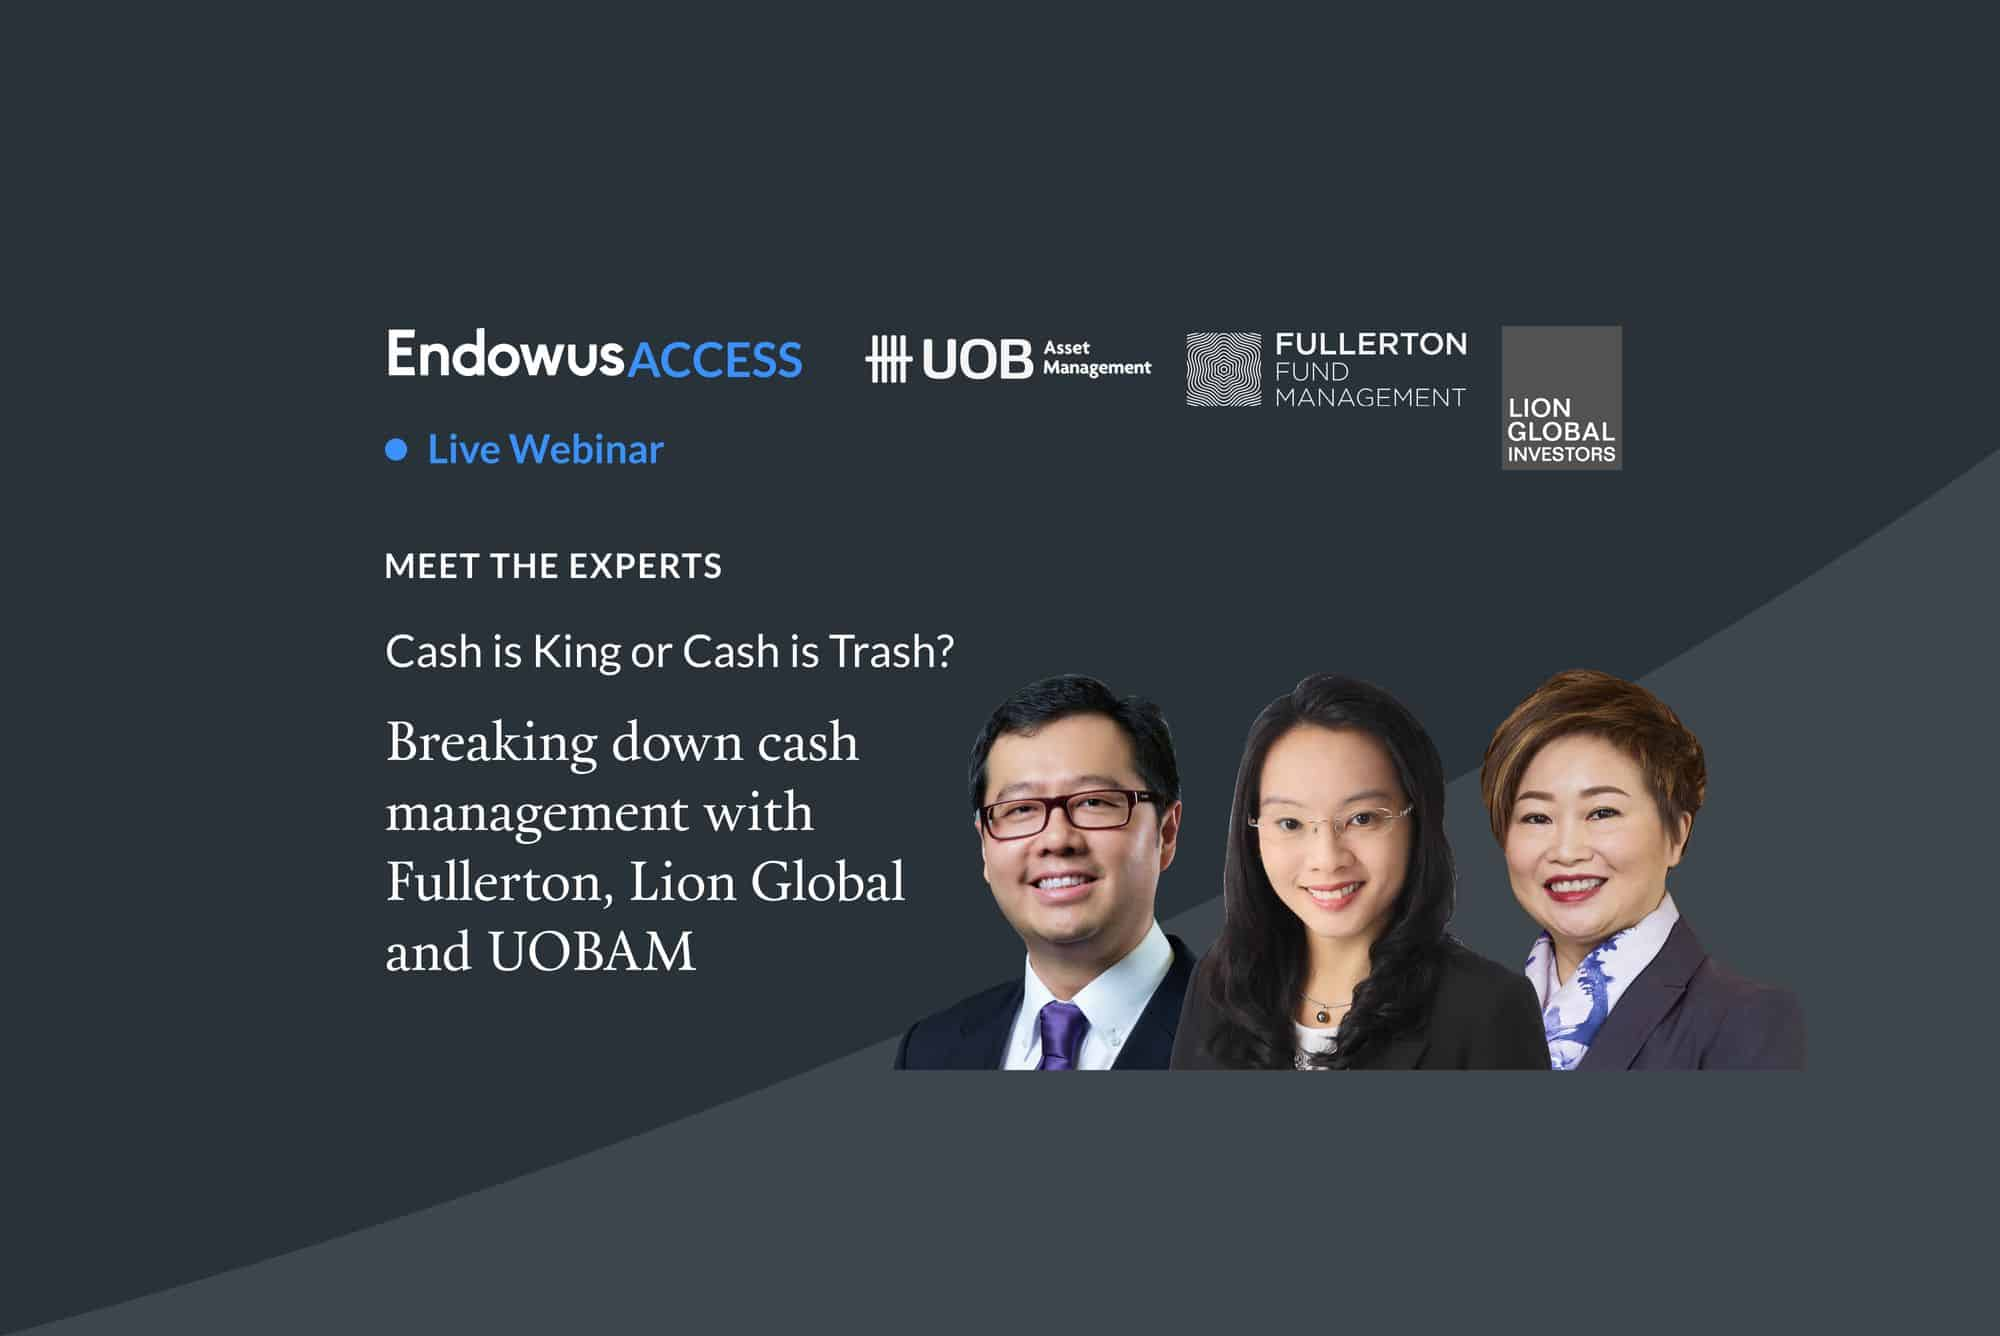 Webinar: Cash is King or Cash is Trash? Breaking down Cash Management Solutions